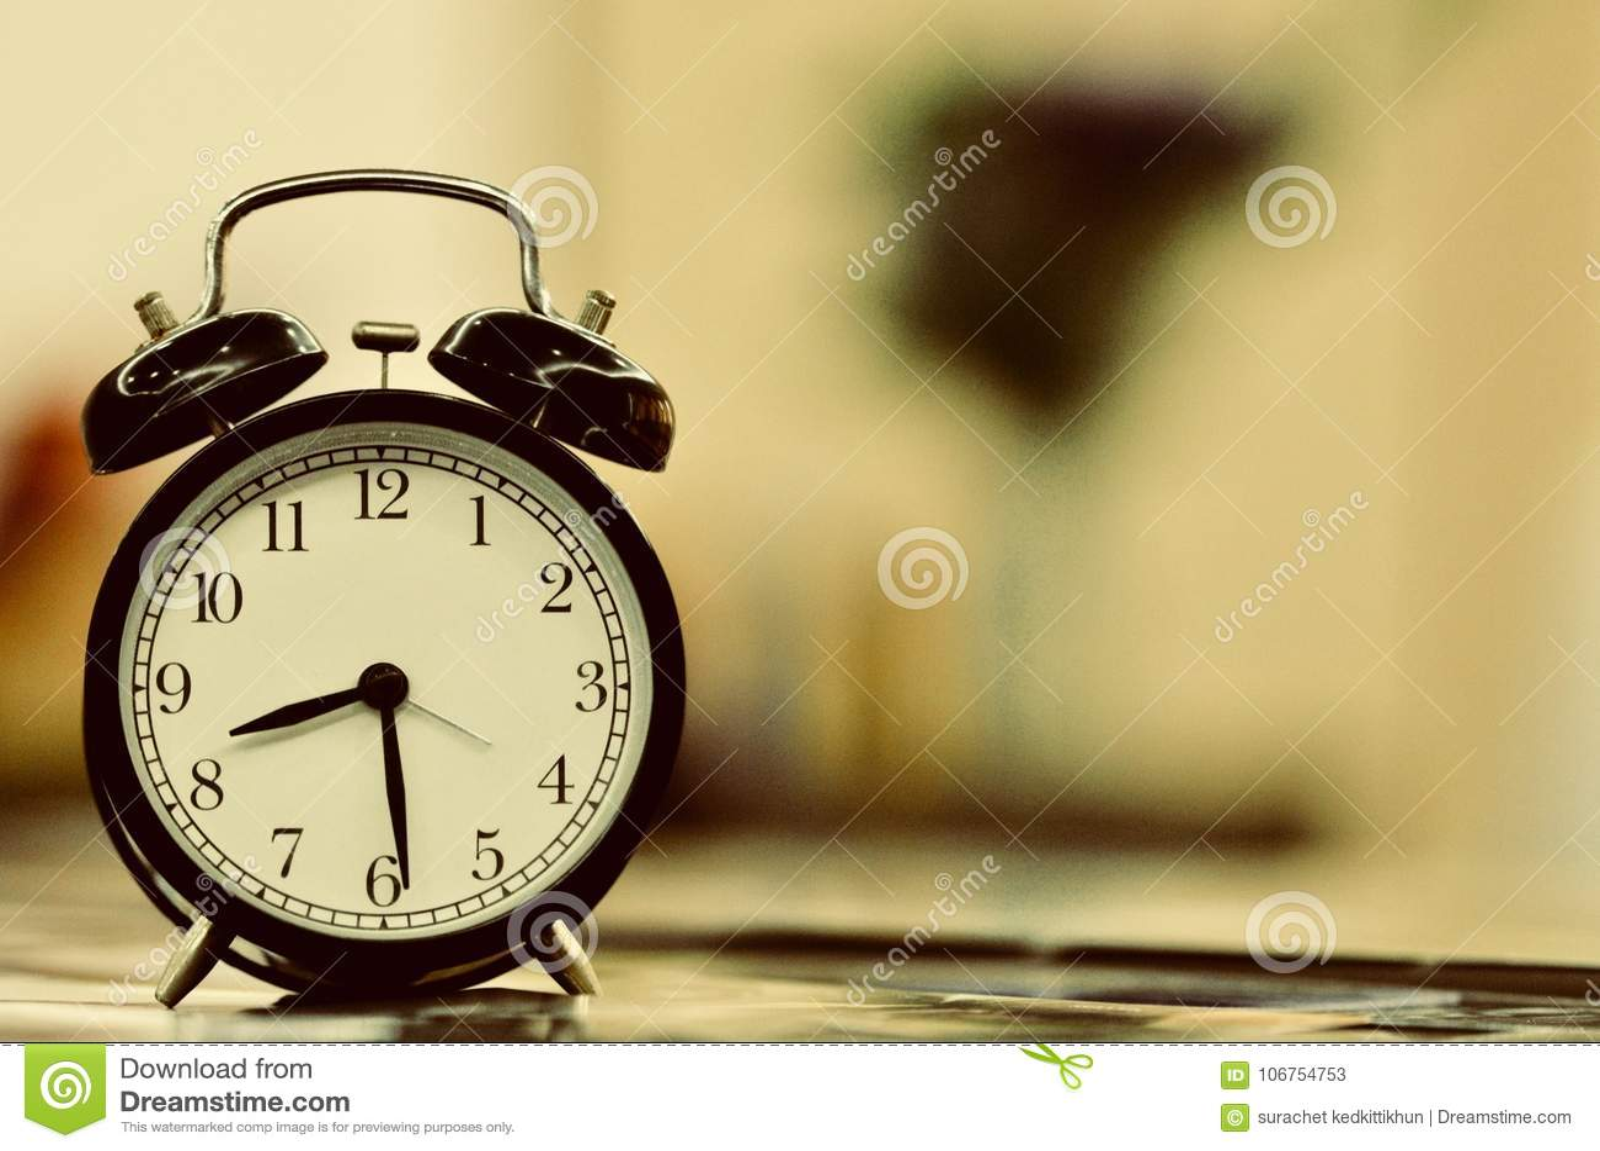 Retro Vintage Style Classic White Alarm Clock On Vintage Bedroom